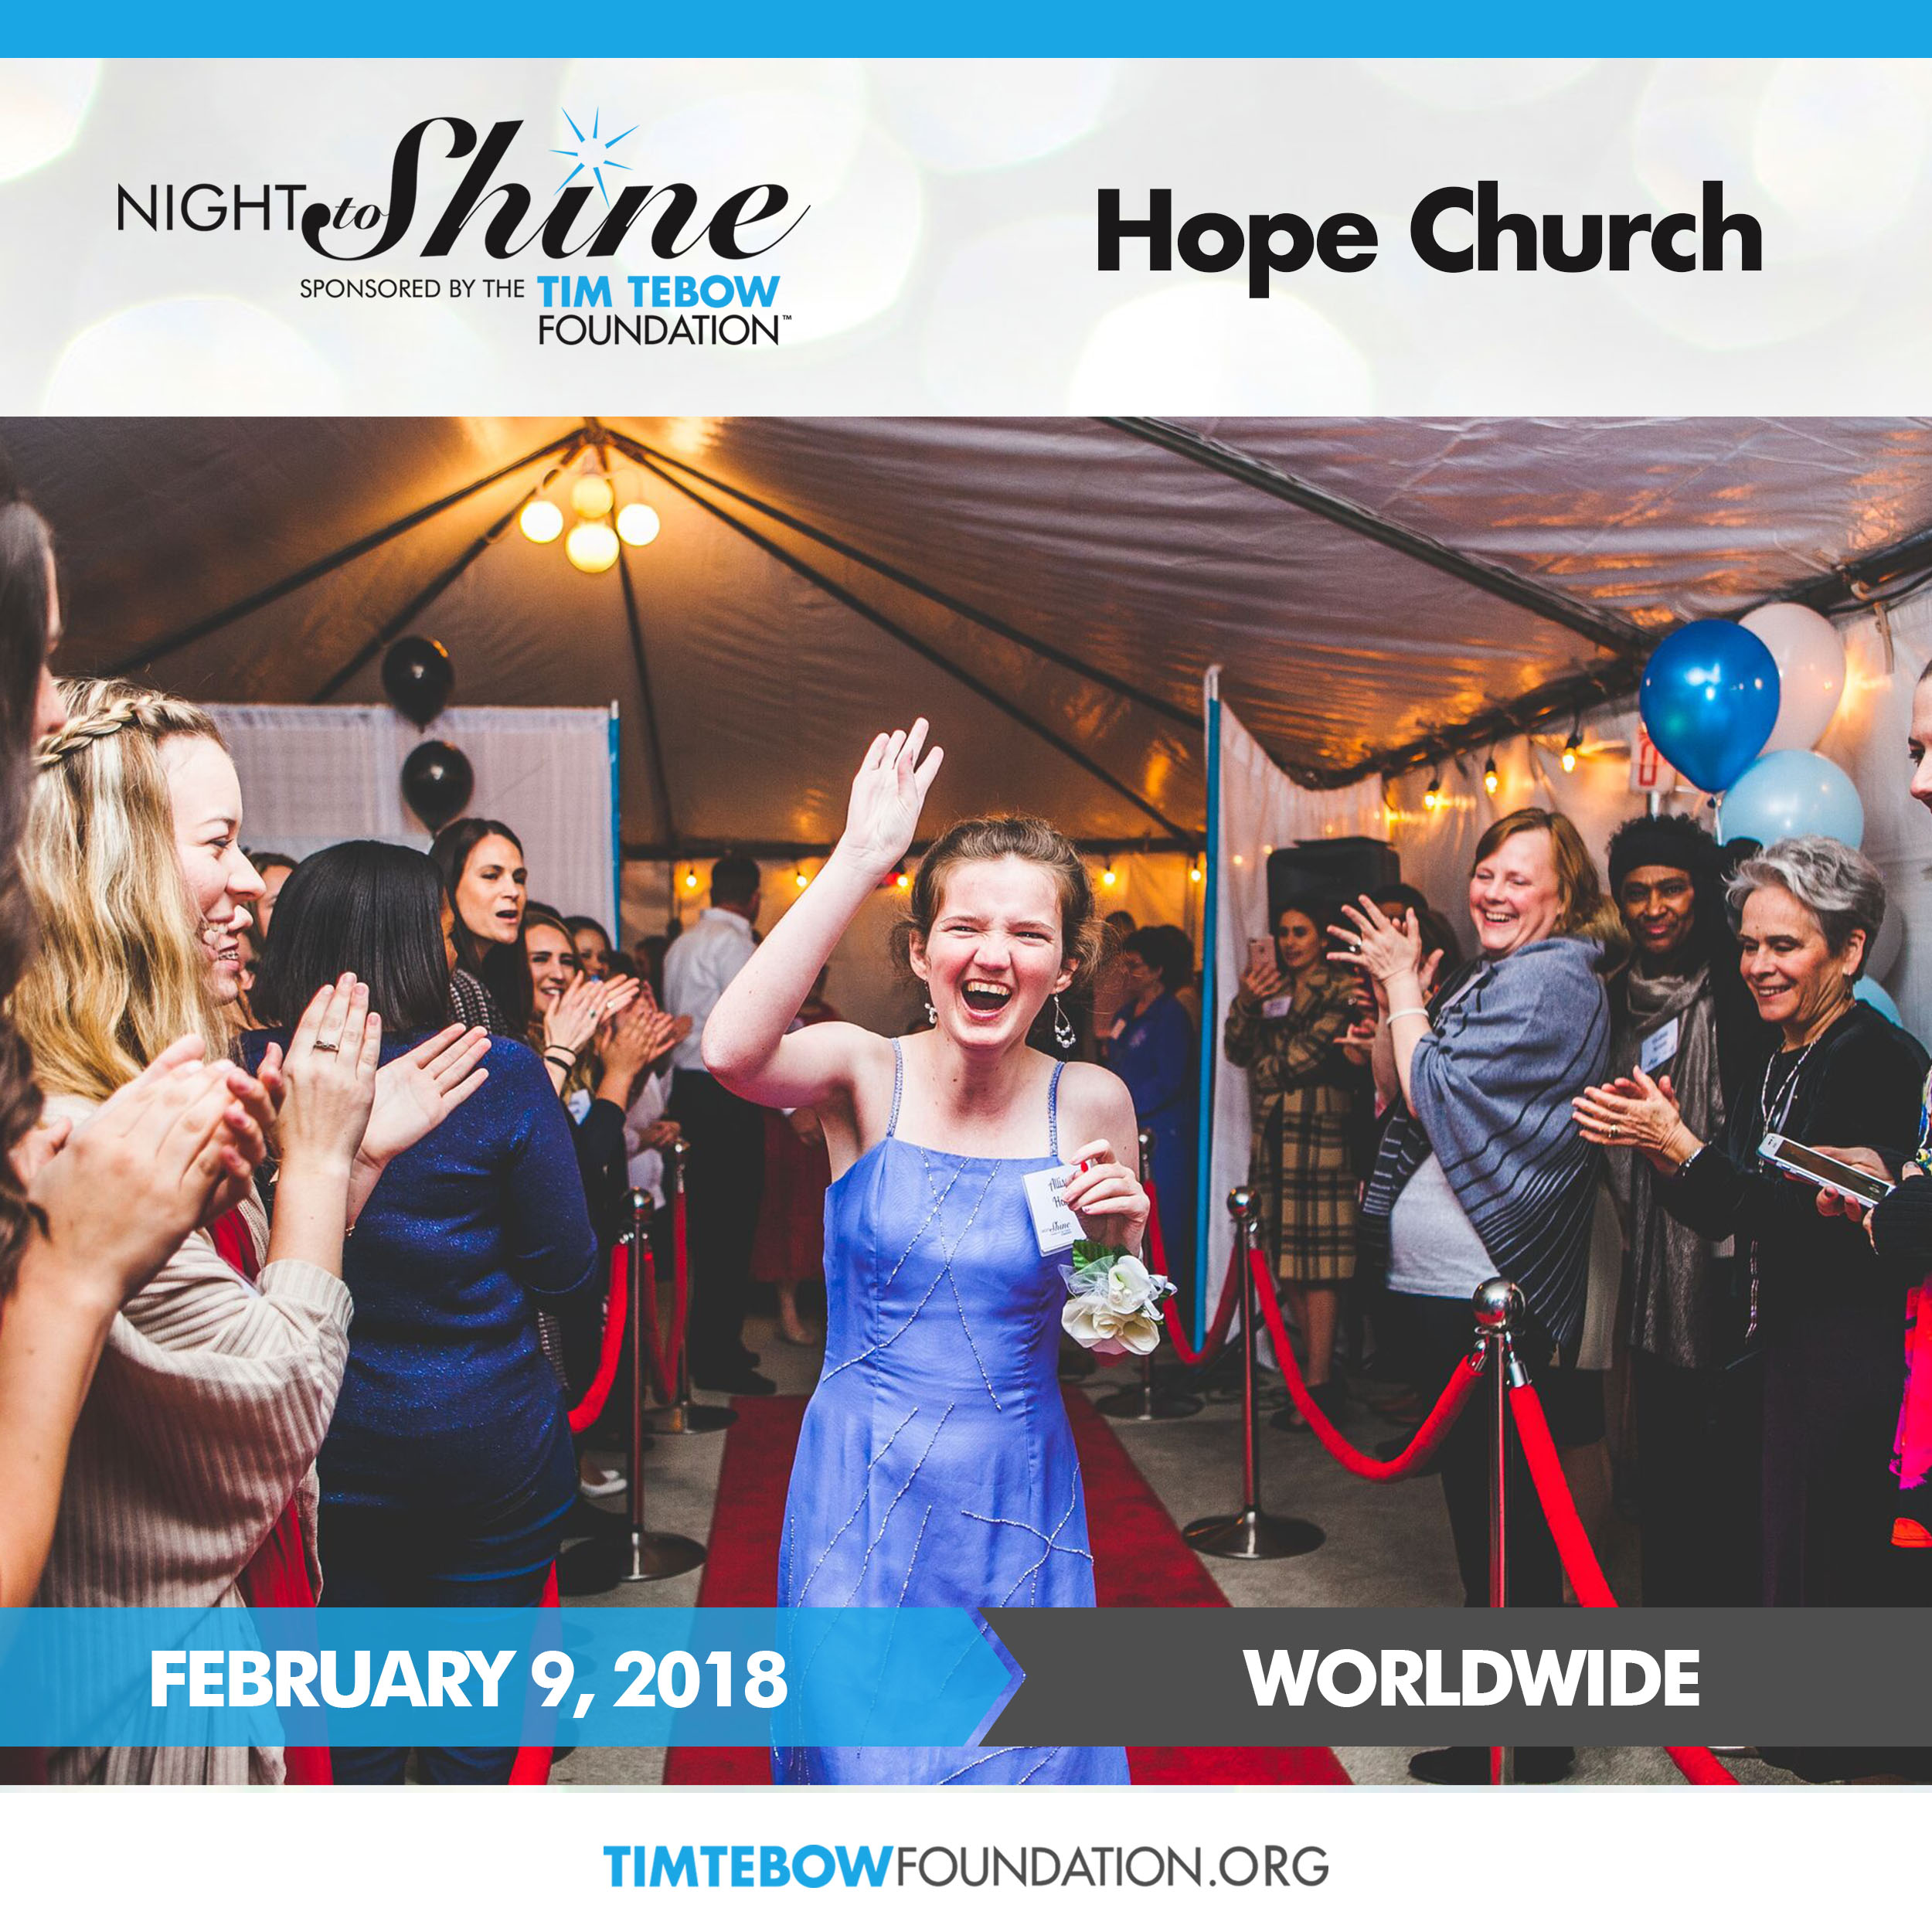 Hope church social media post